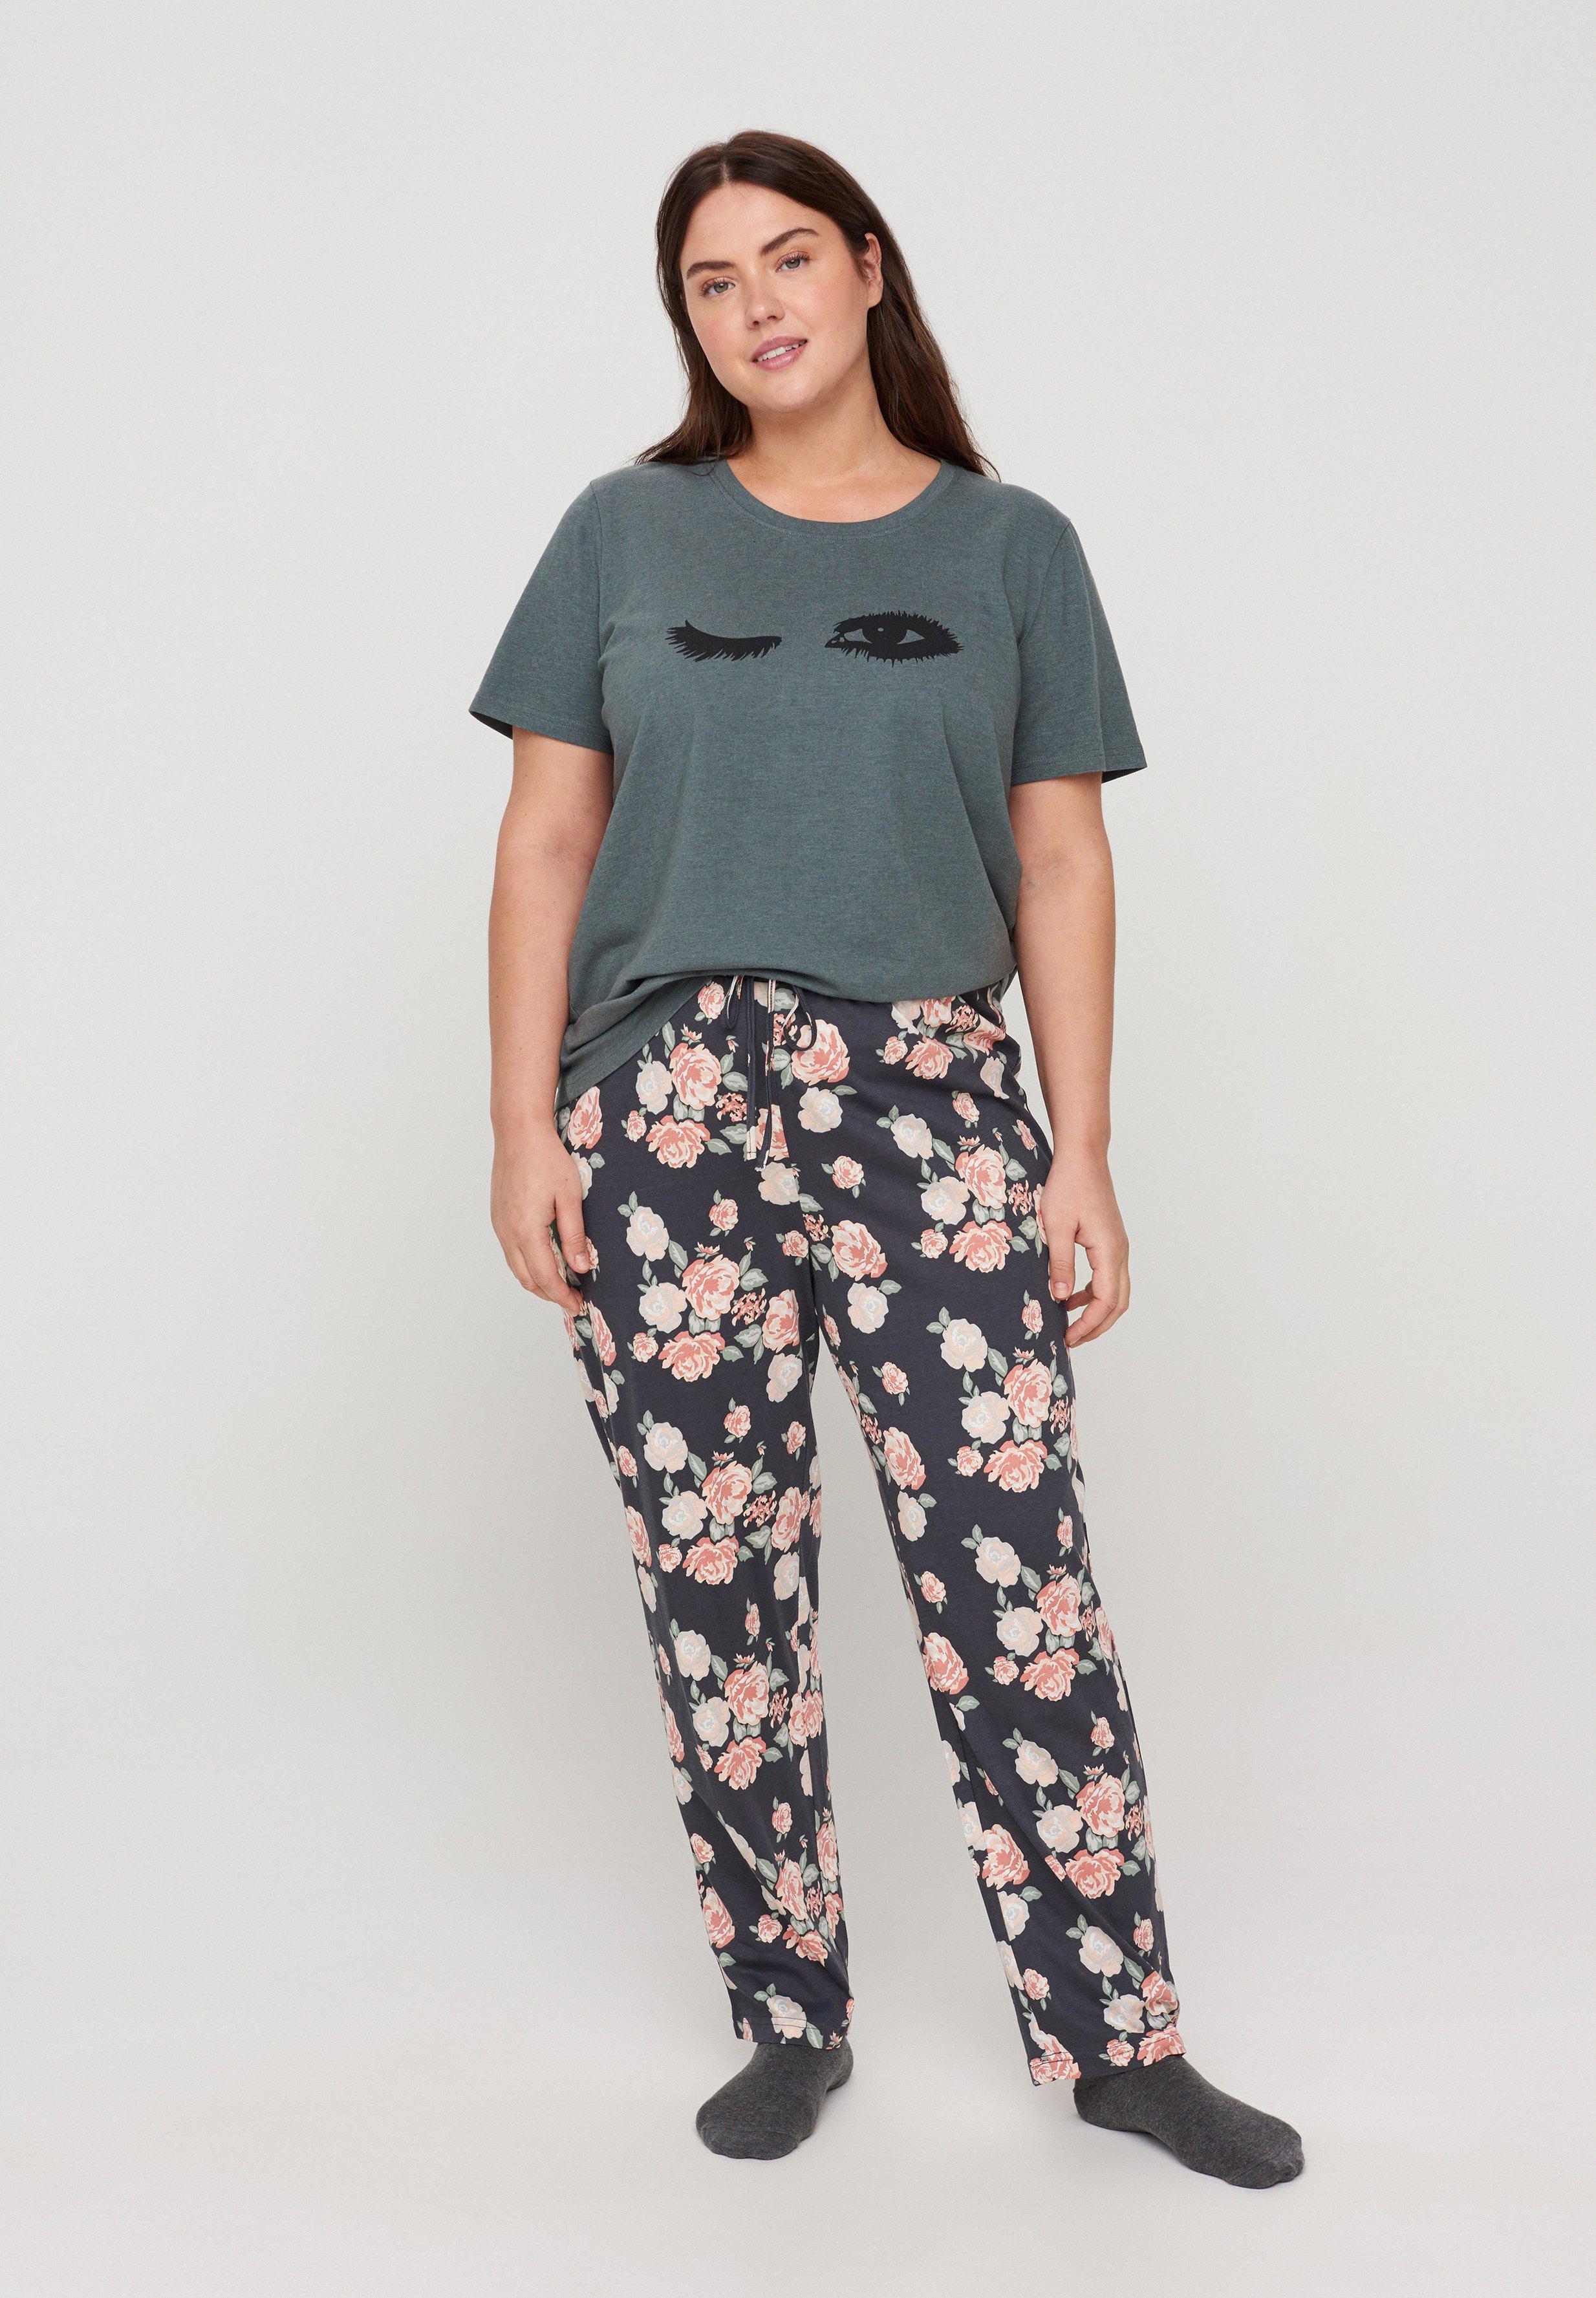 Donna Pantaloni del pigiama - blue flower